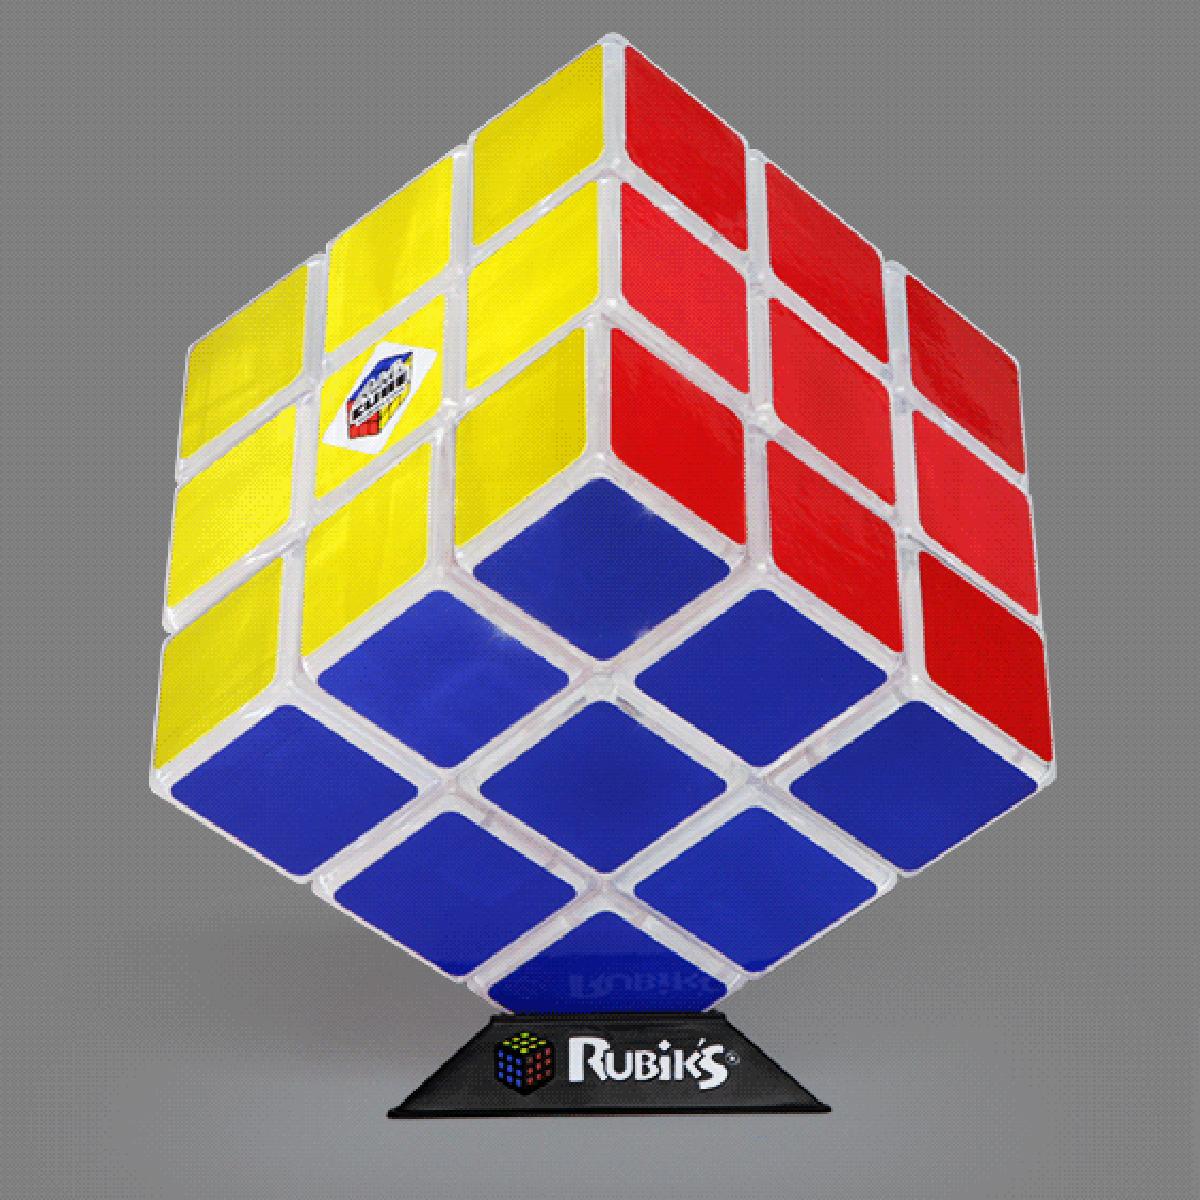 Une lampe en forme de Rubik's Cube